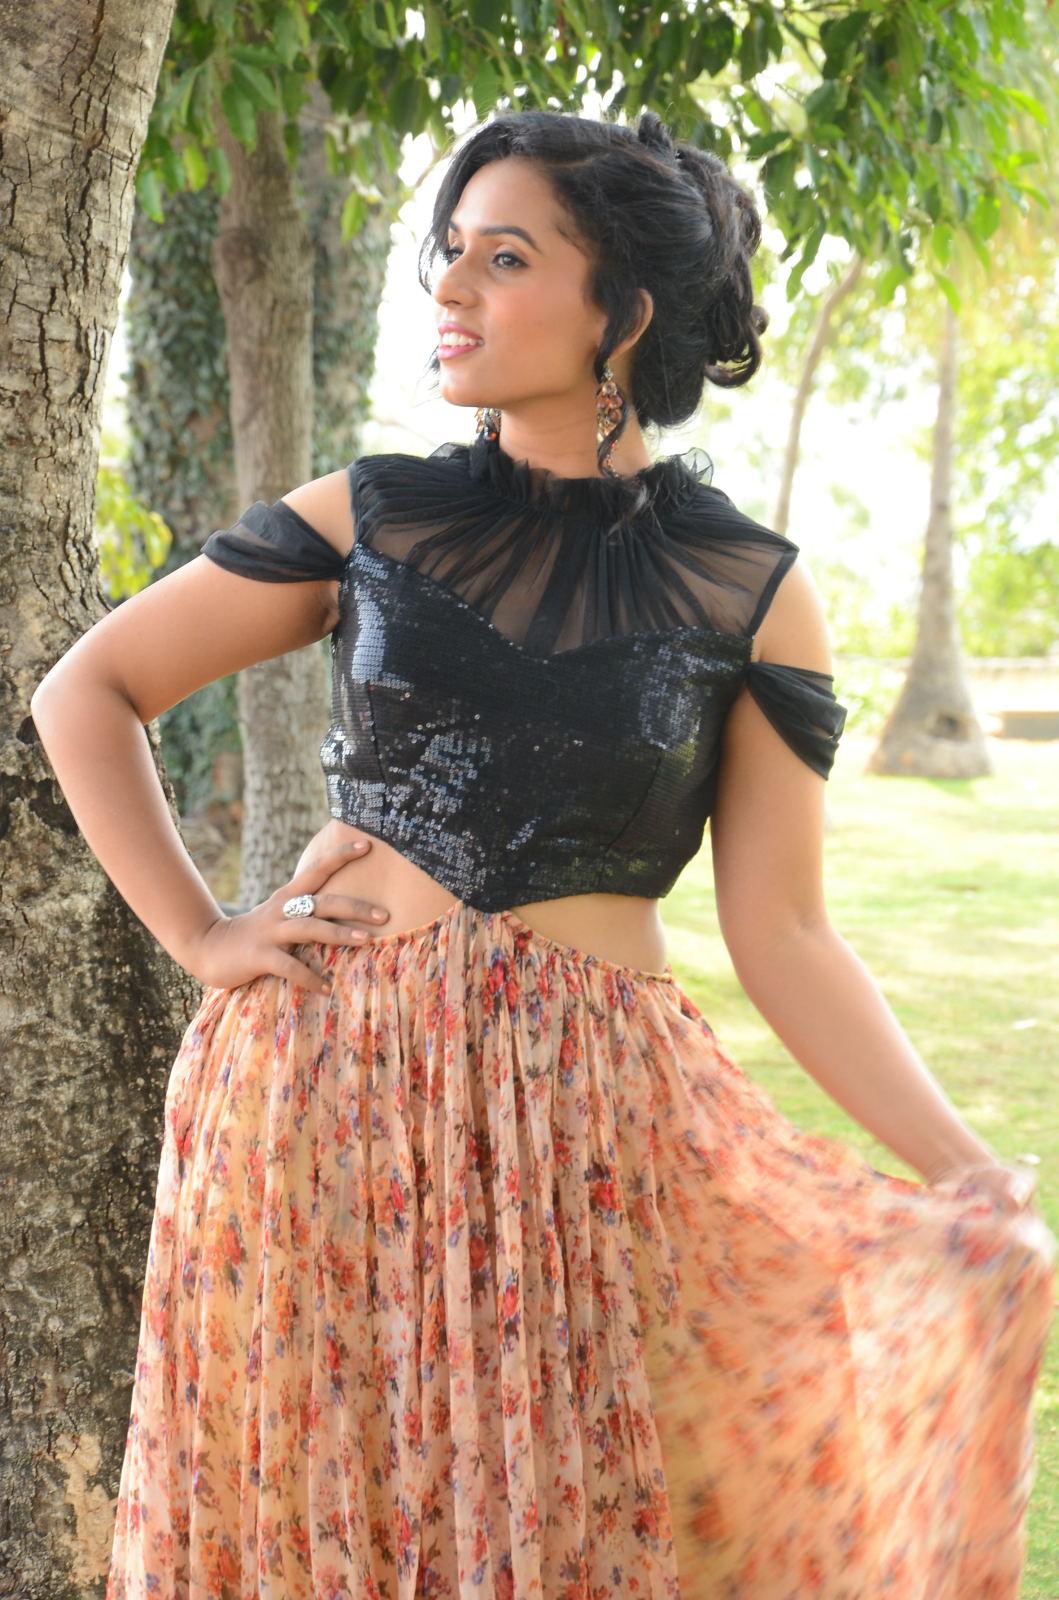 chetana uttej Brand New Photo Stills Of South Actress Chetana Uttej   Tollywood Chetana Uttej 14